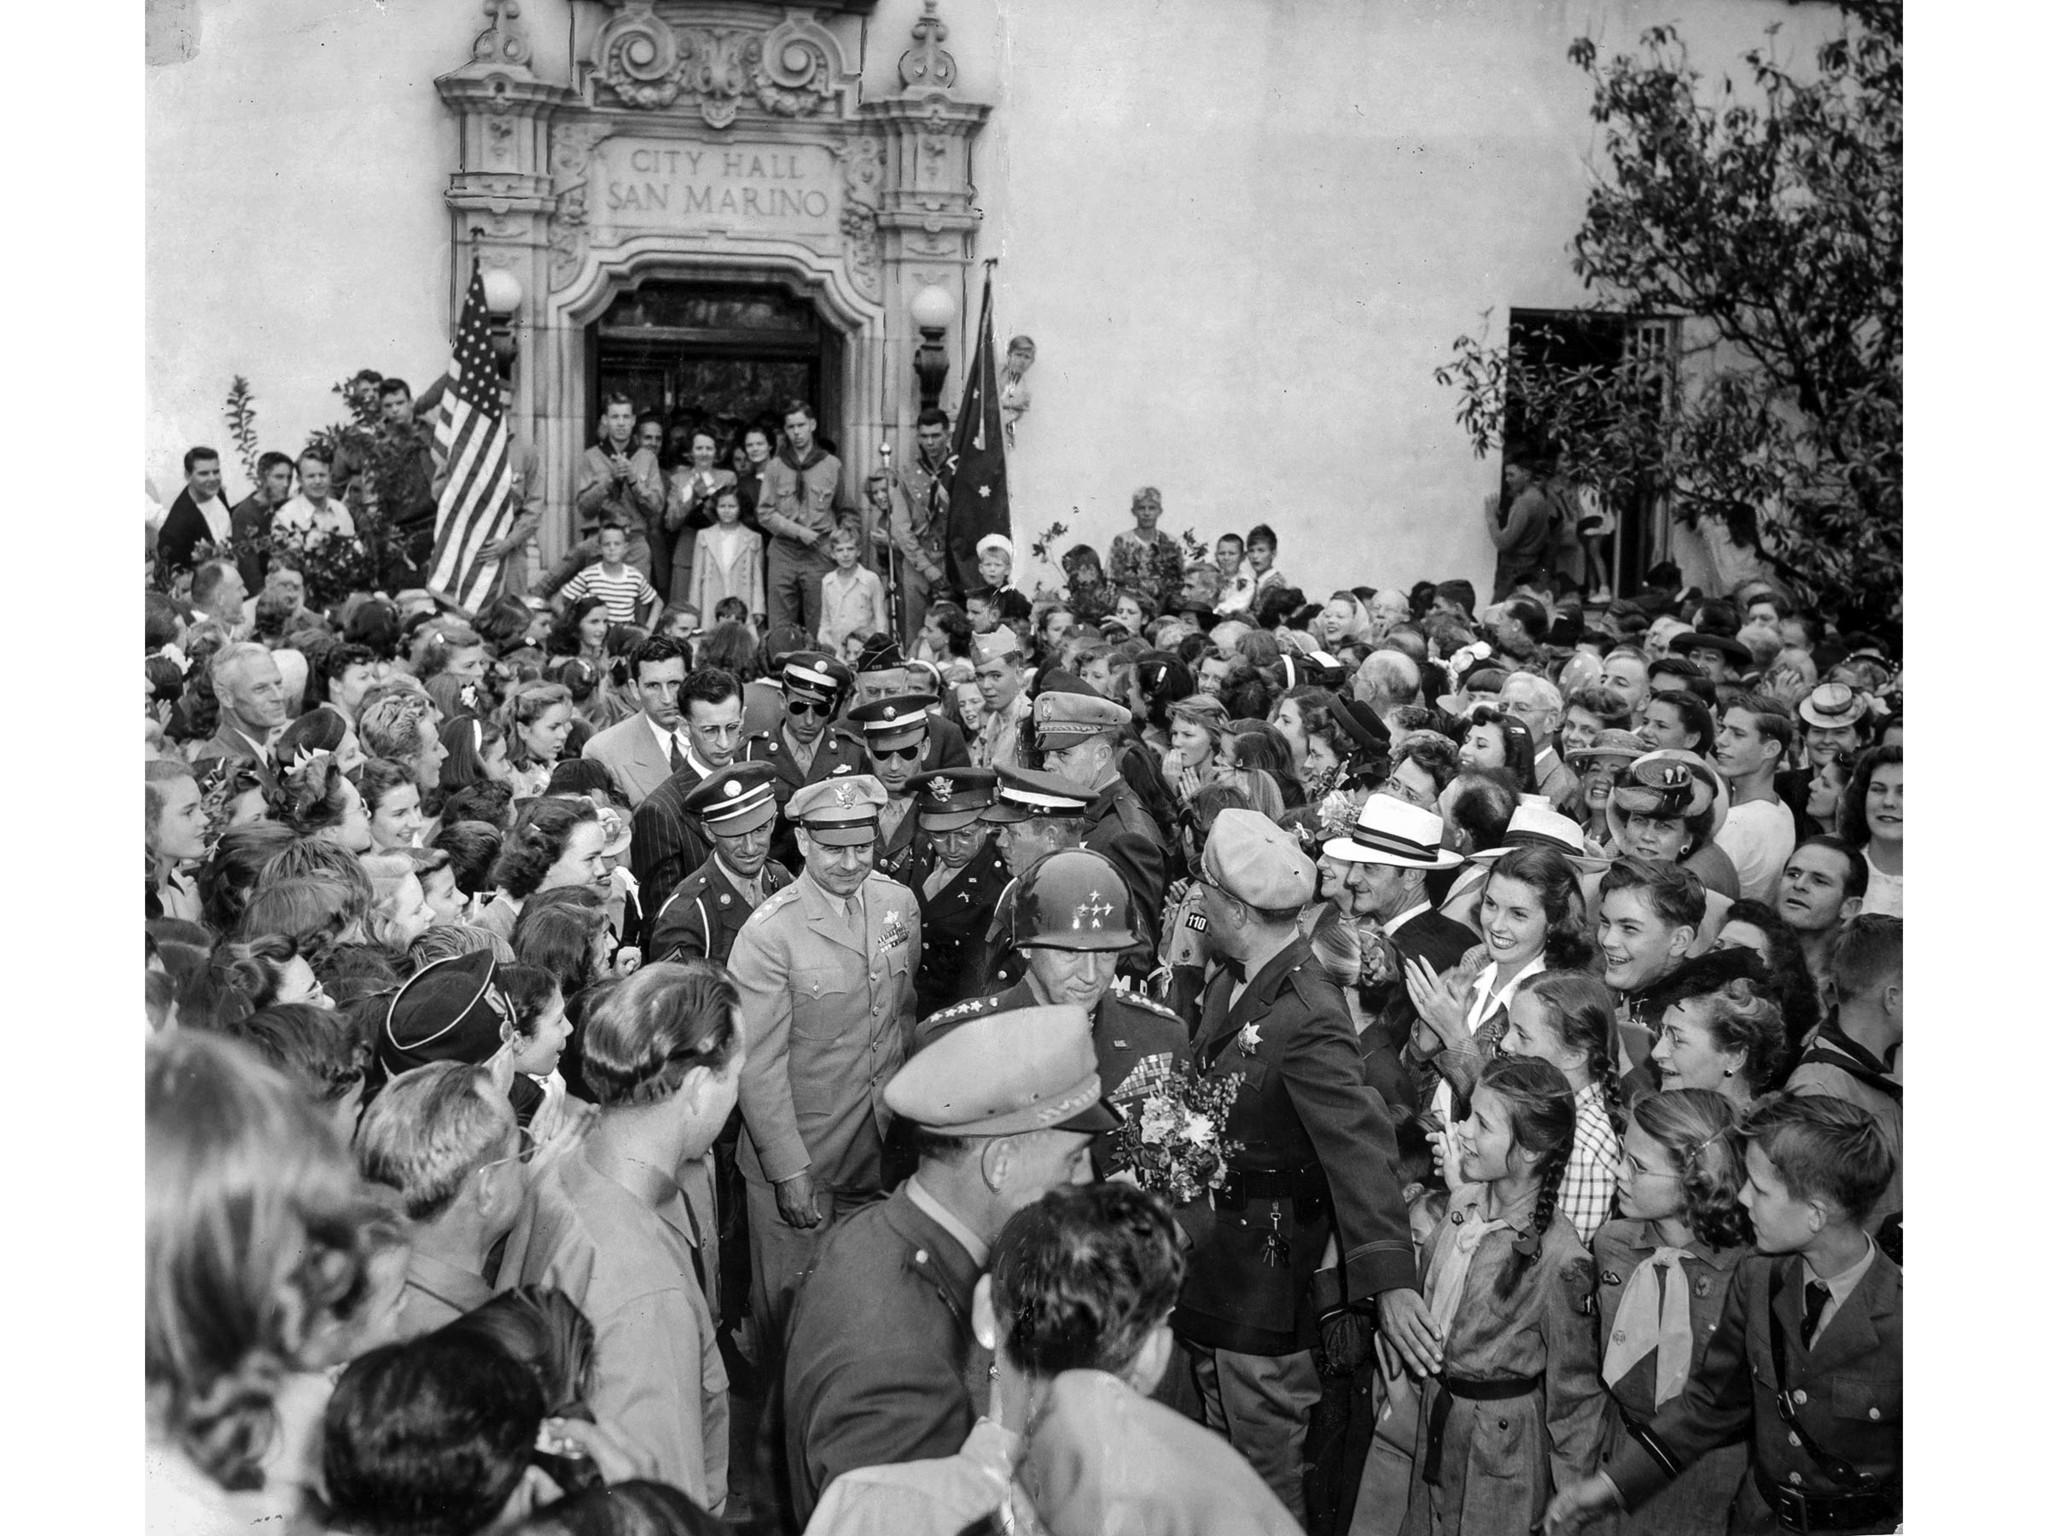 June 10, 1945: Gen. George s. Patton Jr., leads Lt. Gen. James Doolittle out of San Marino City Hall